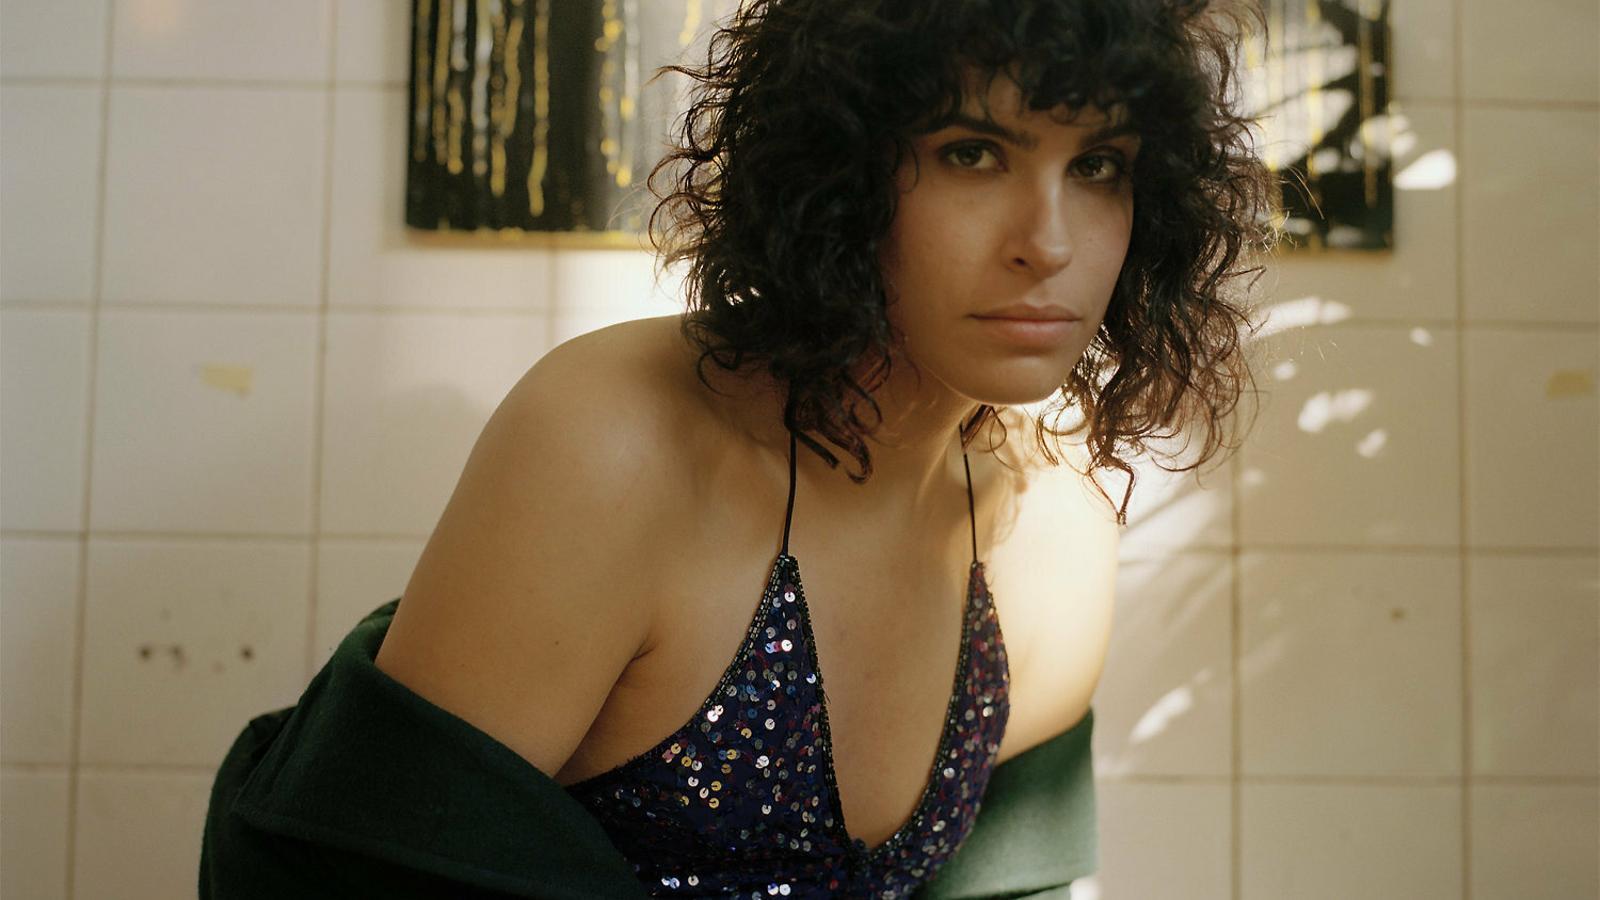 'The bisexual': una sèrie 'queer' sobre la desubicació emocional